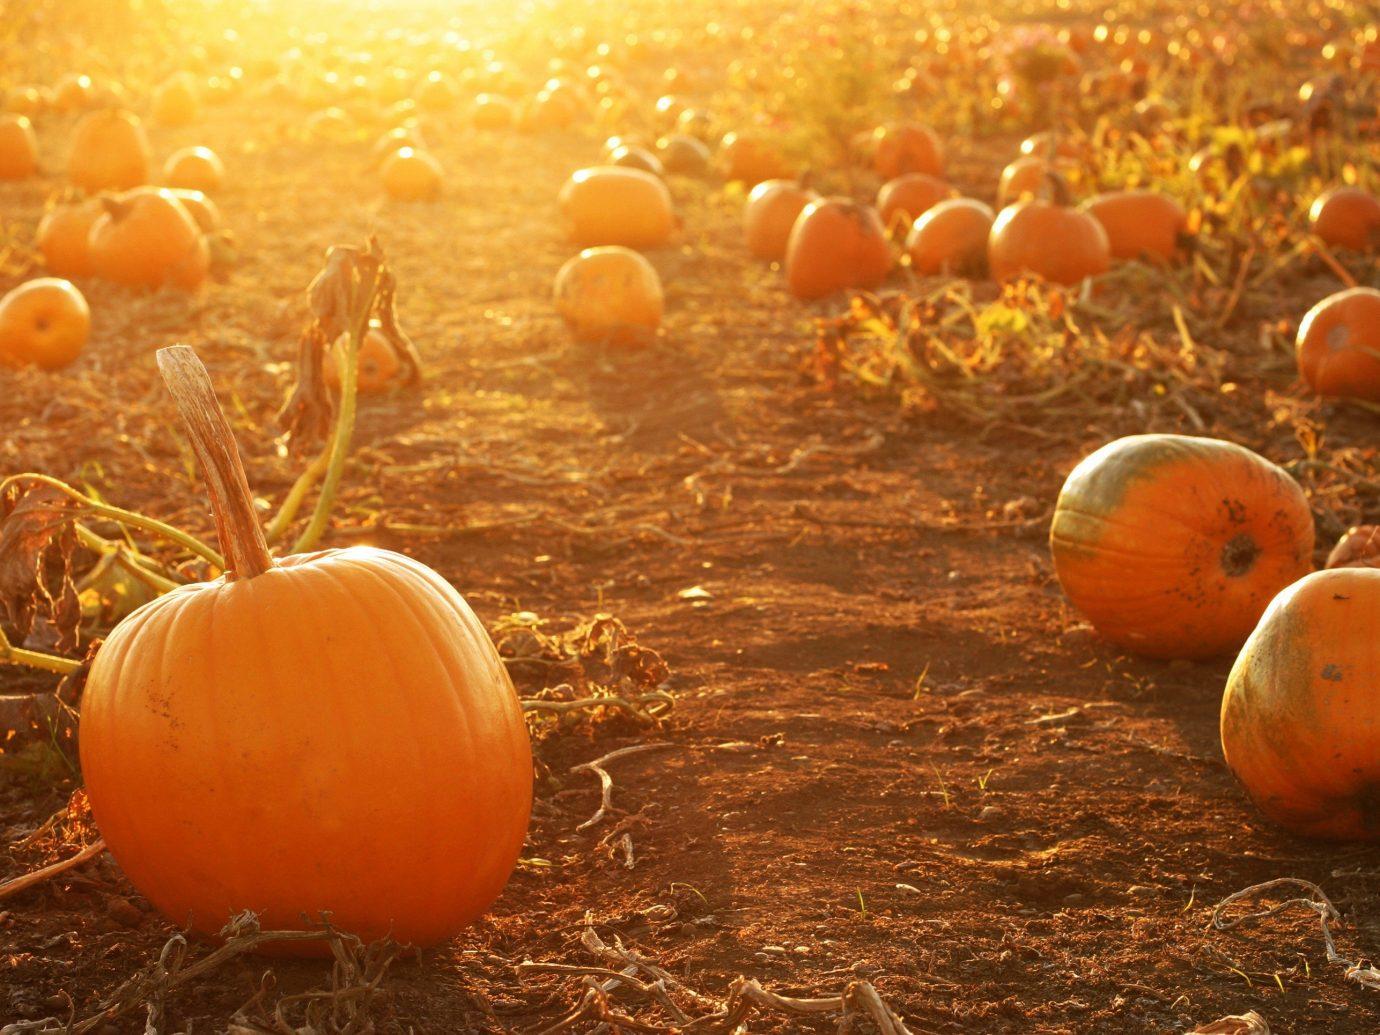 Trip Ideas outdoor pumpkin macro photography plant autumn season morning produce leaf sunlight flower food